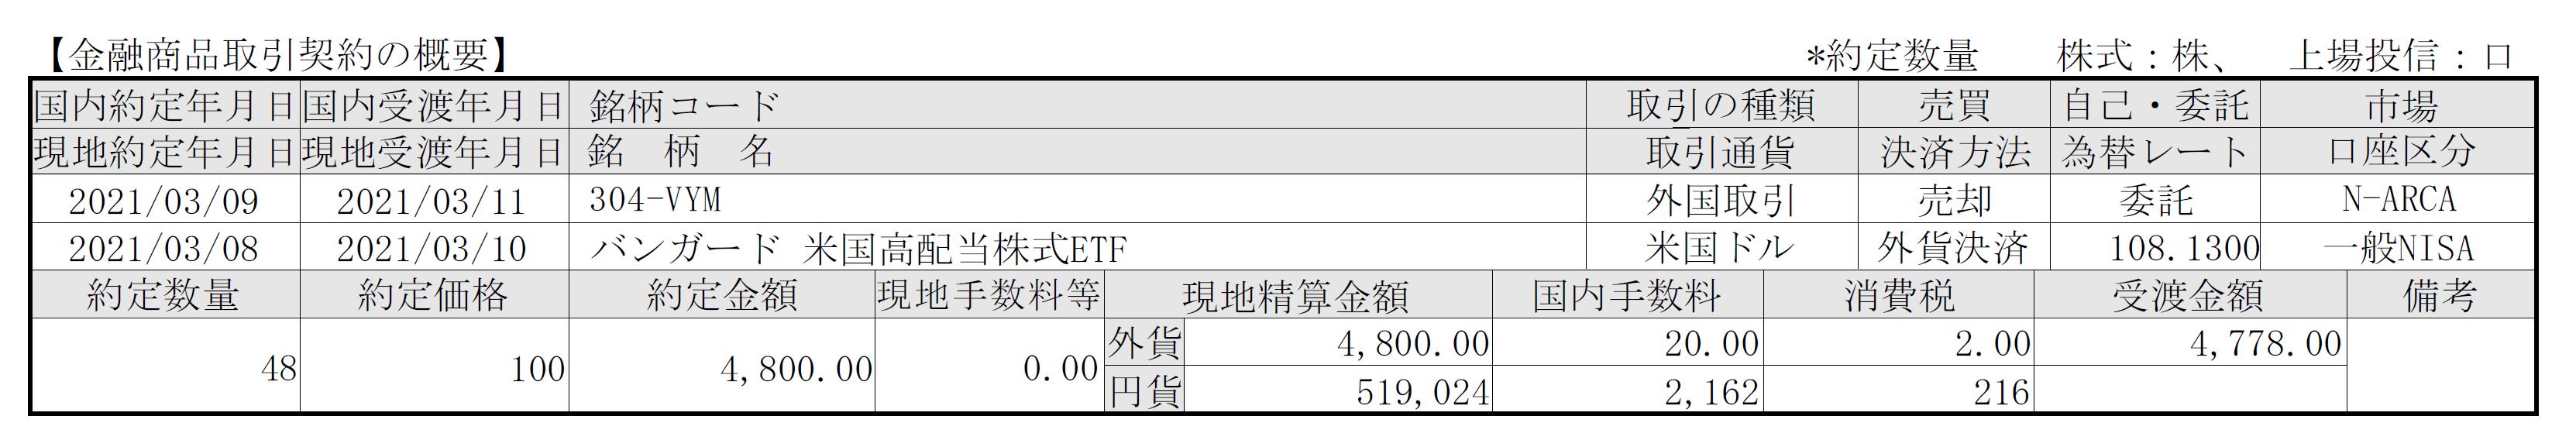 f:id:hodo-work:20210311192726p:plain